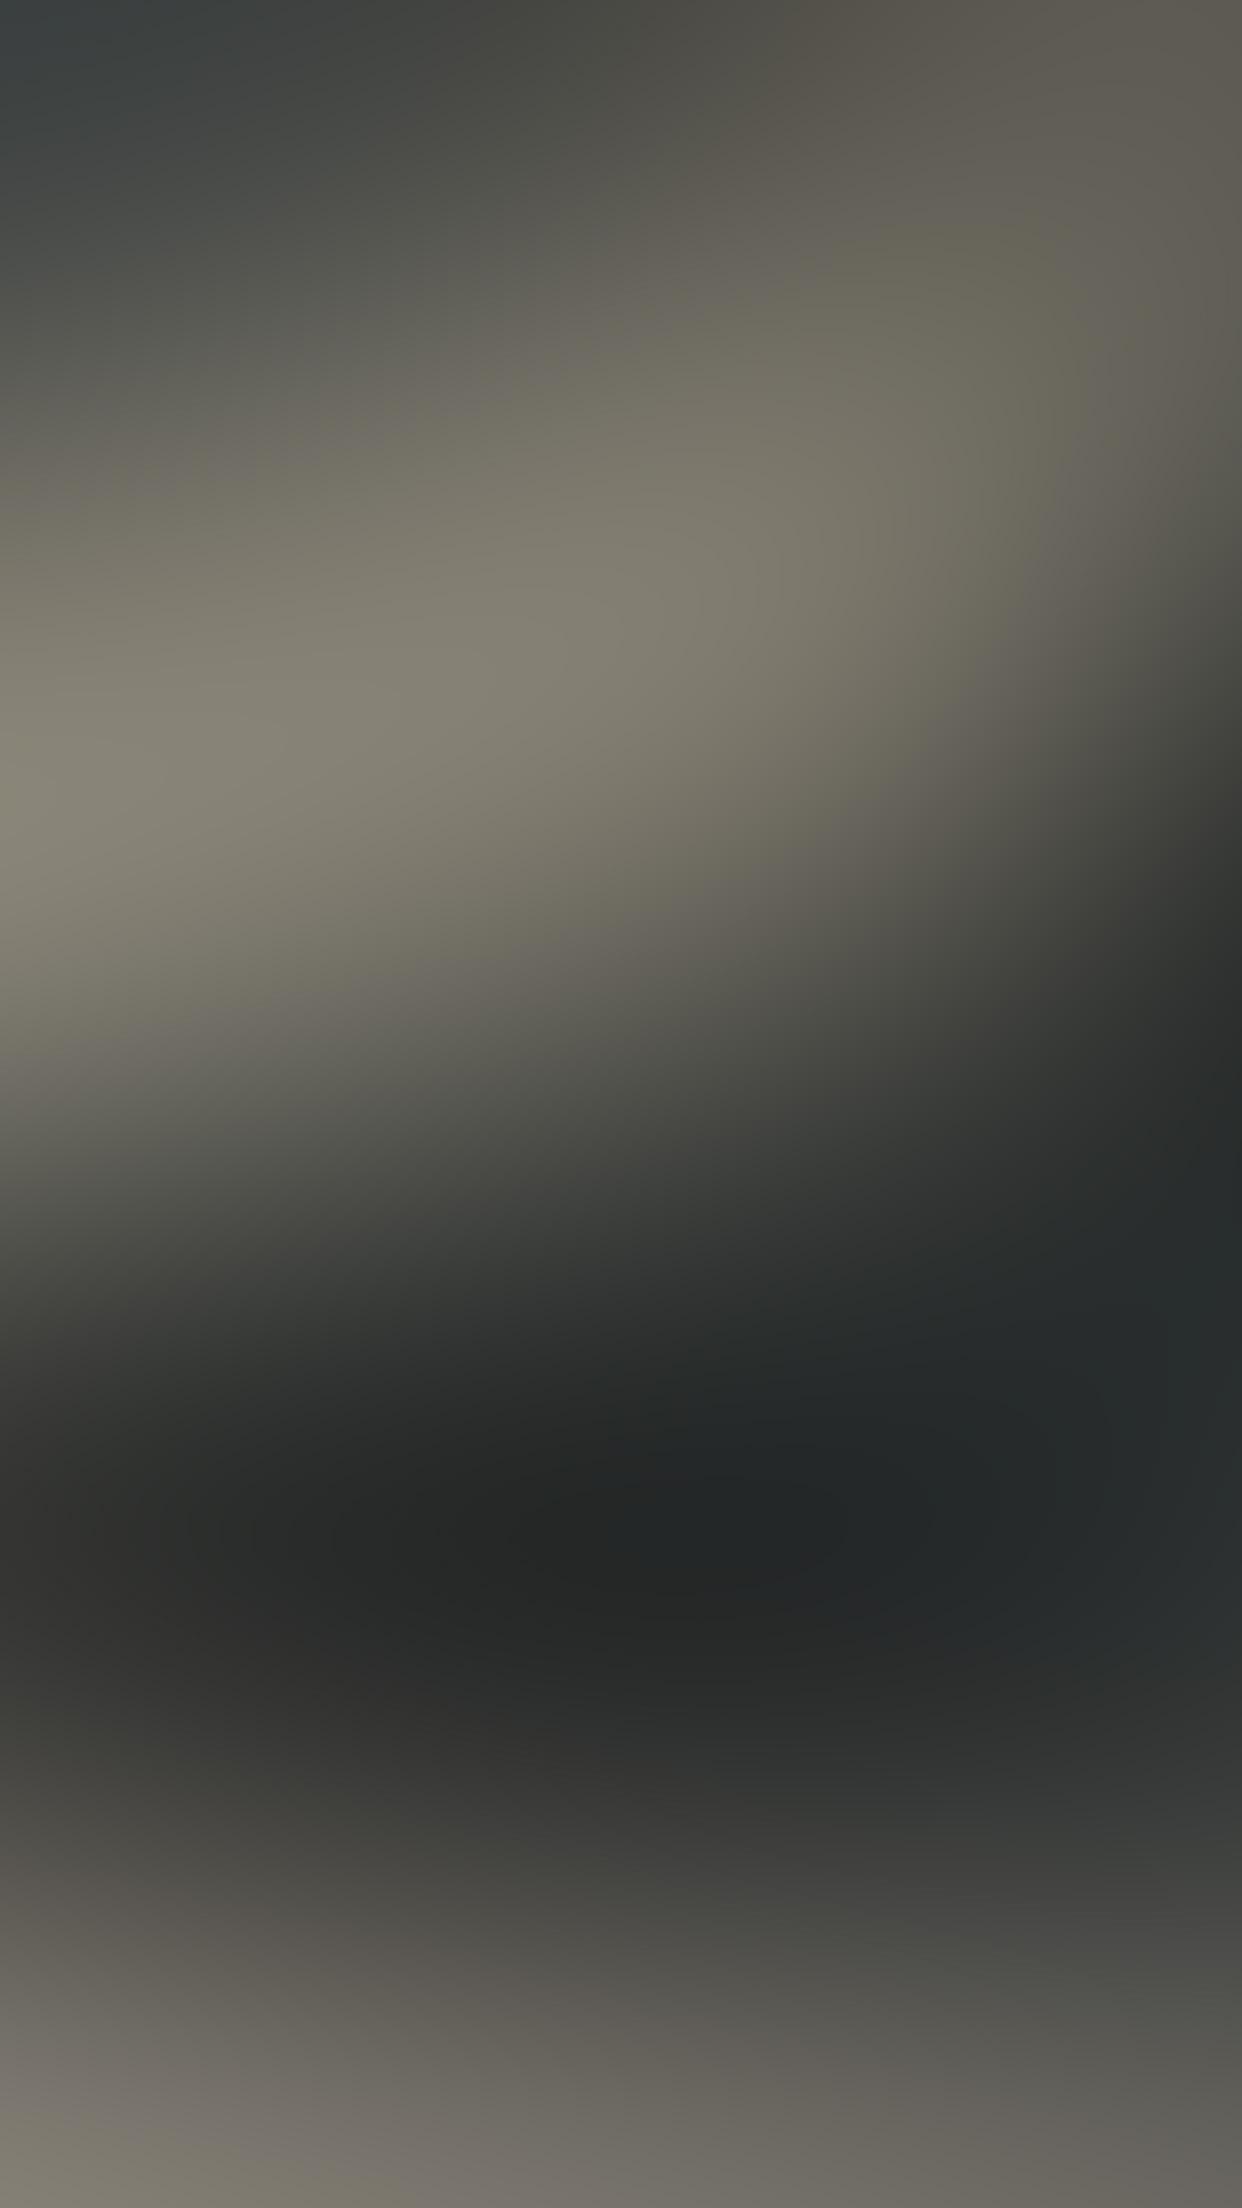 Iphone6papers Com Iphone 6 Wallpaper Sj61 Gray Dark Gradation Blur